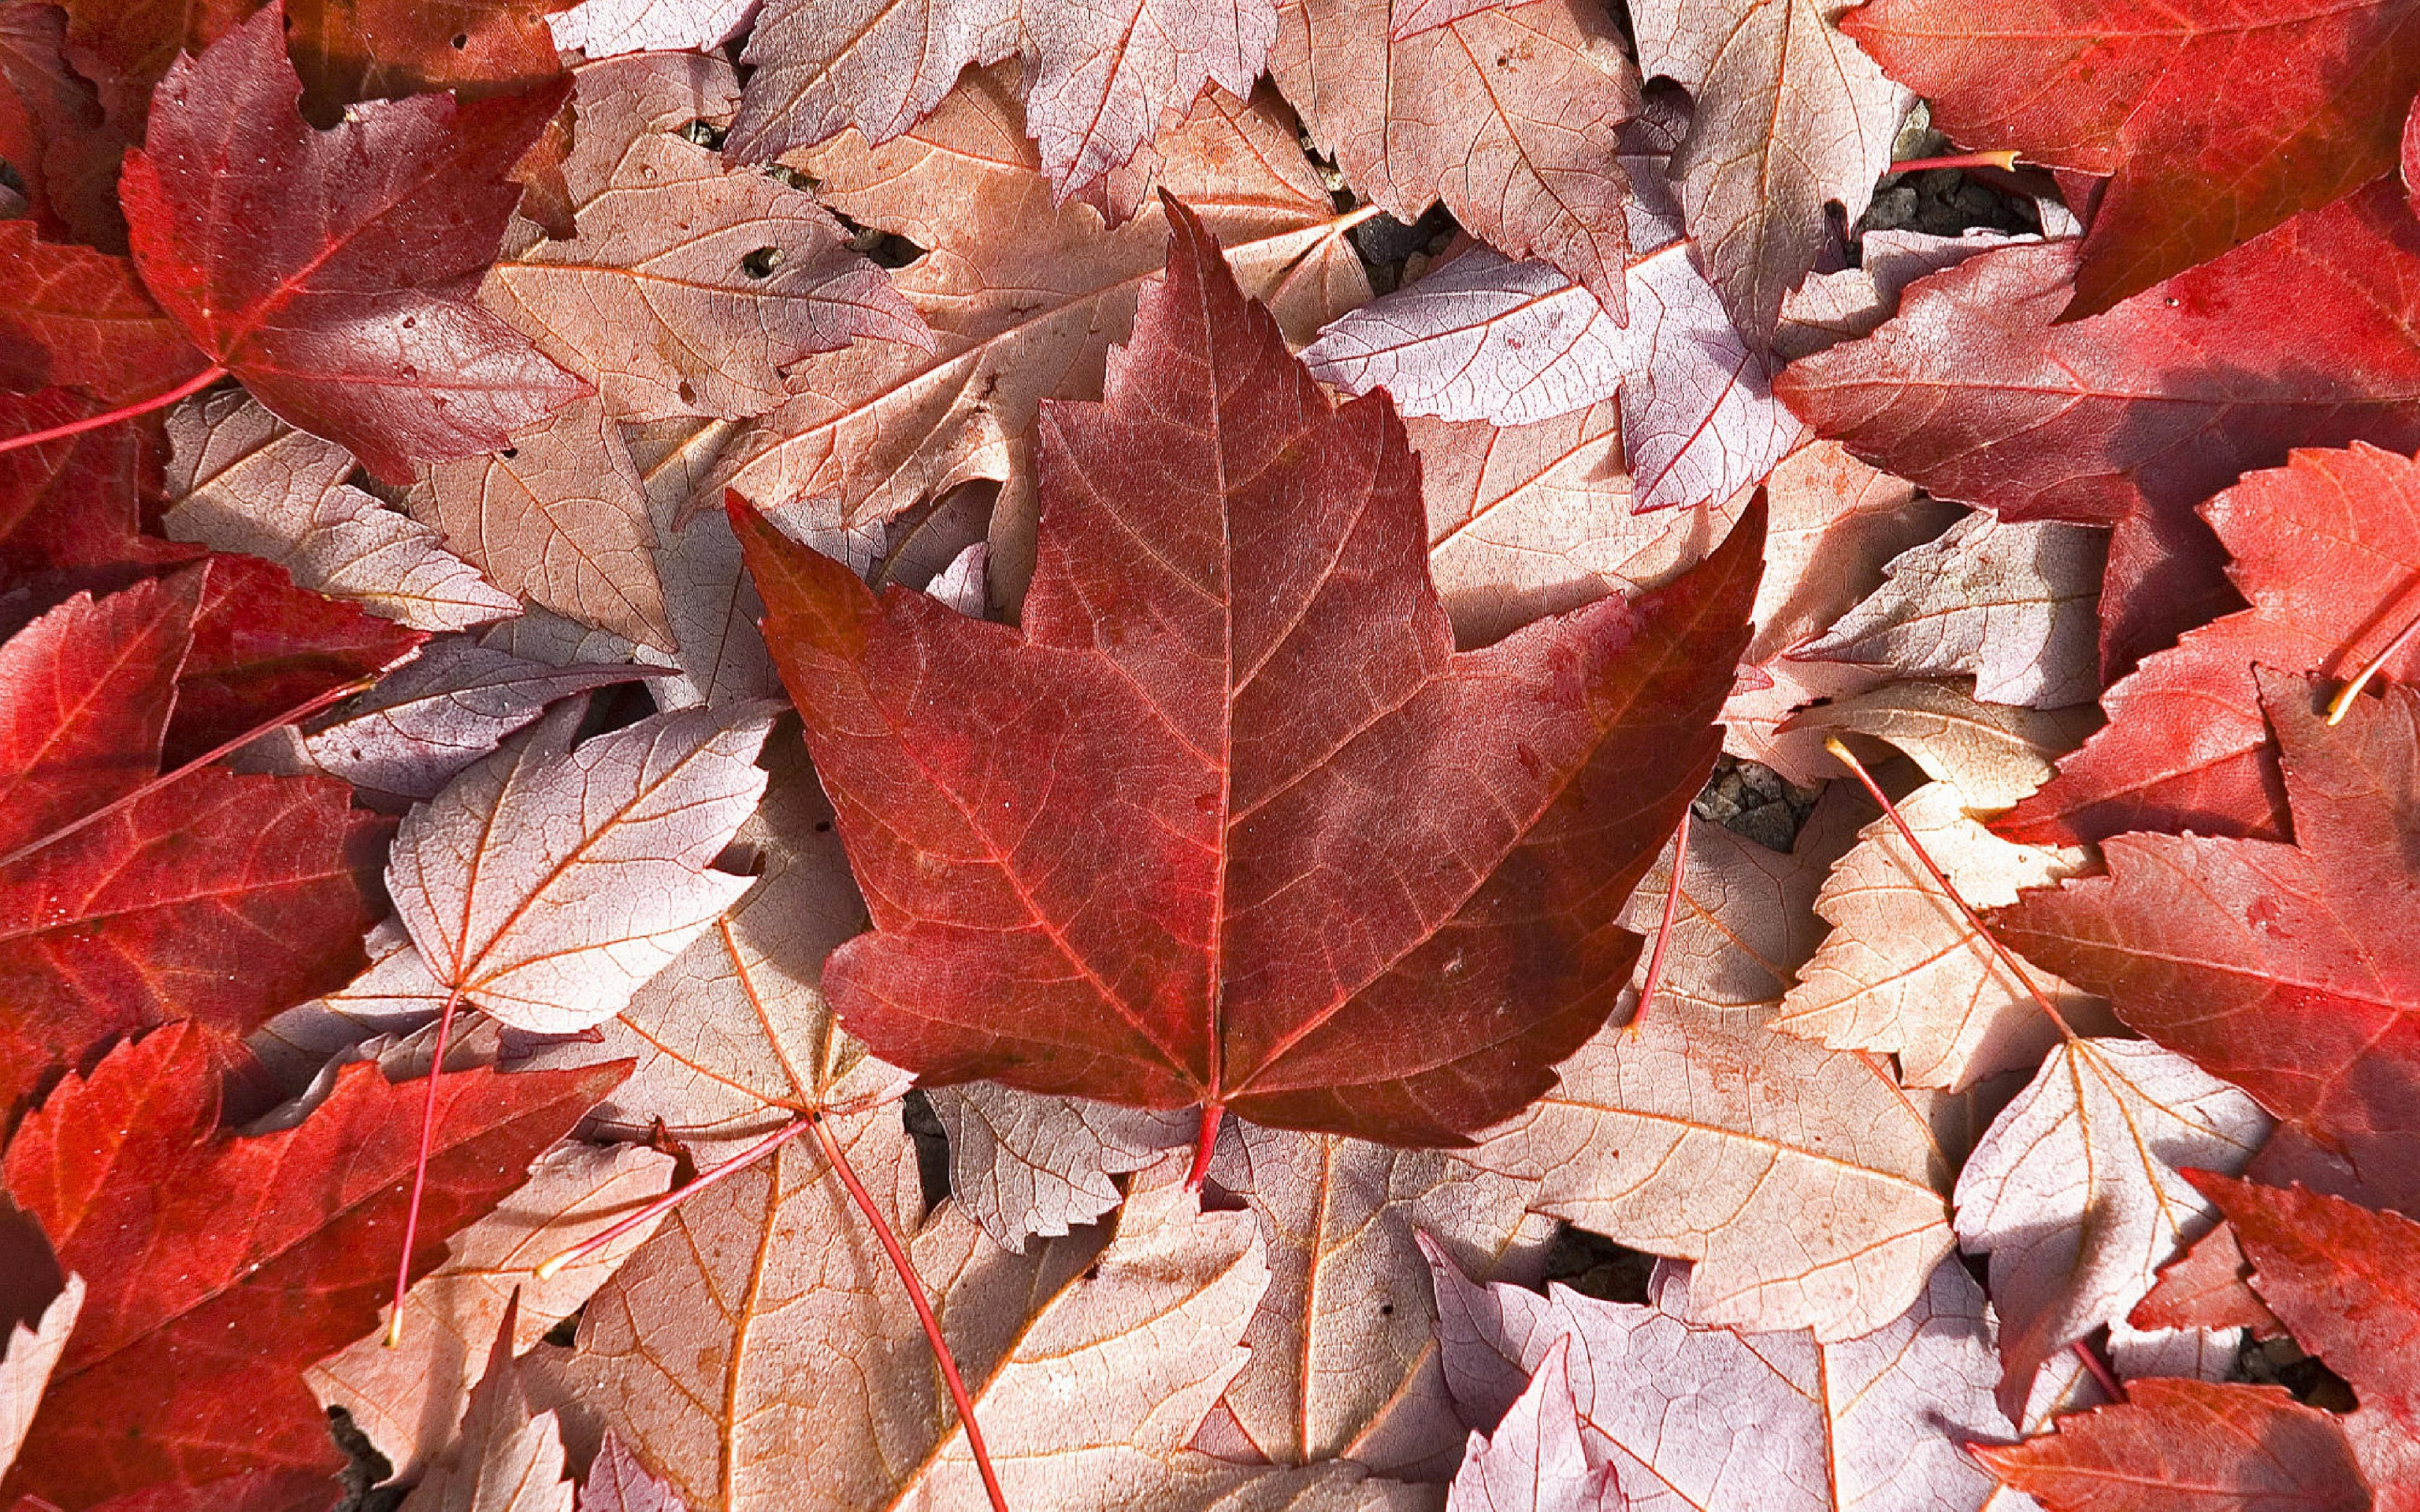 canadian maple leaf images - HD1920×1080